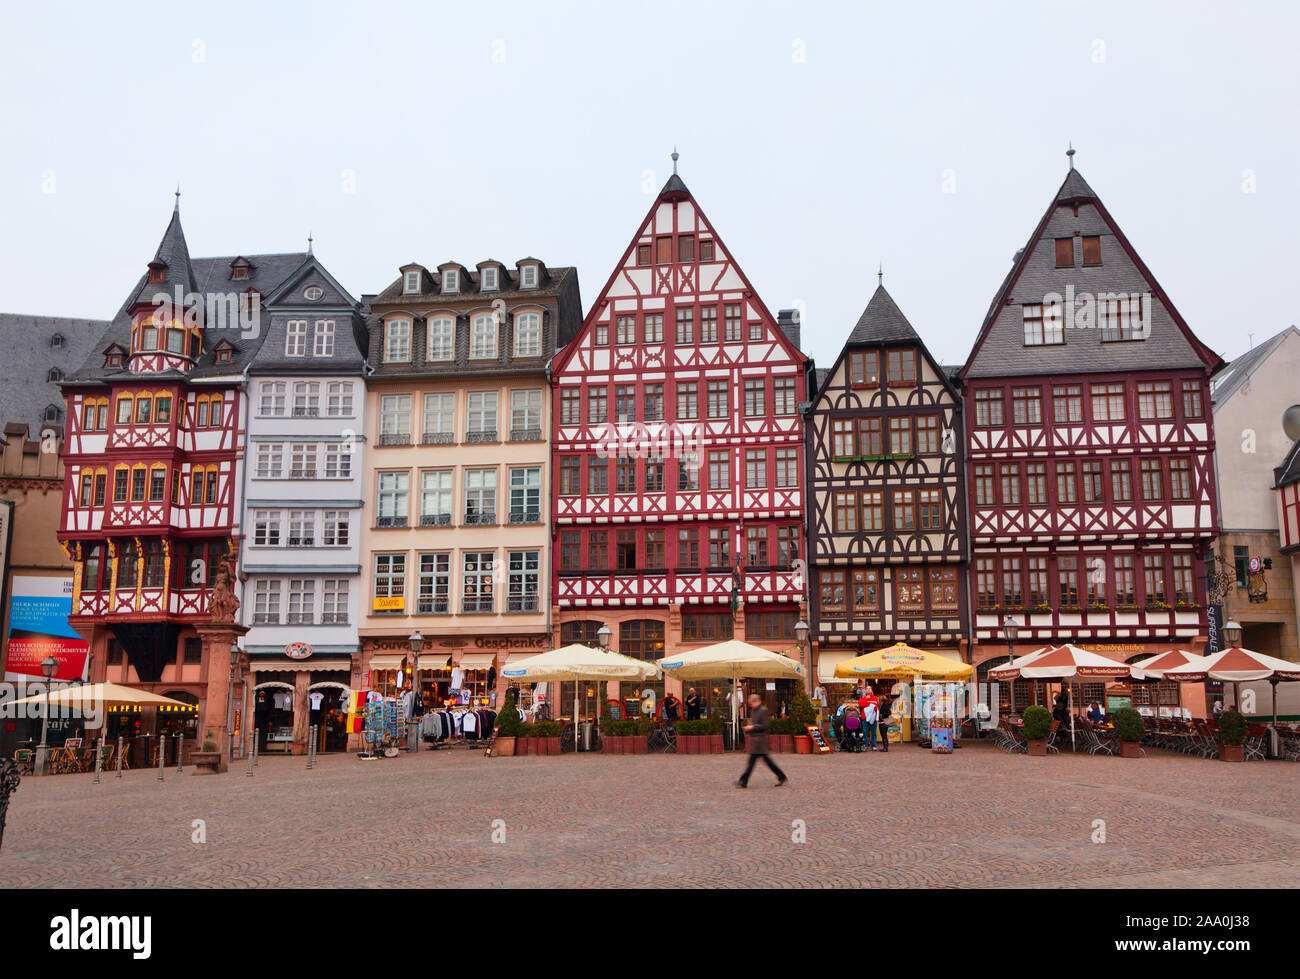 Old restored Romer square in Frankfurt am Main city, Germany Stock Photo